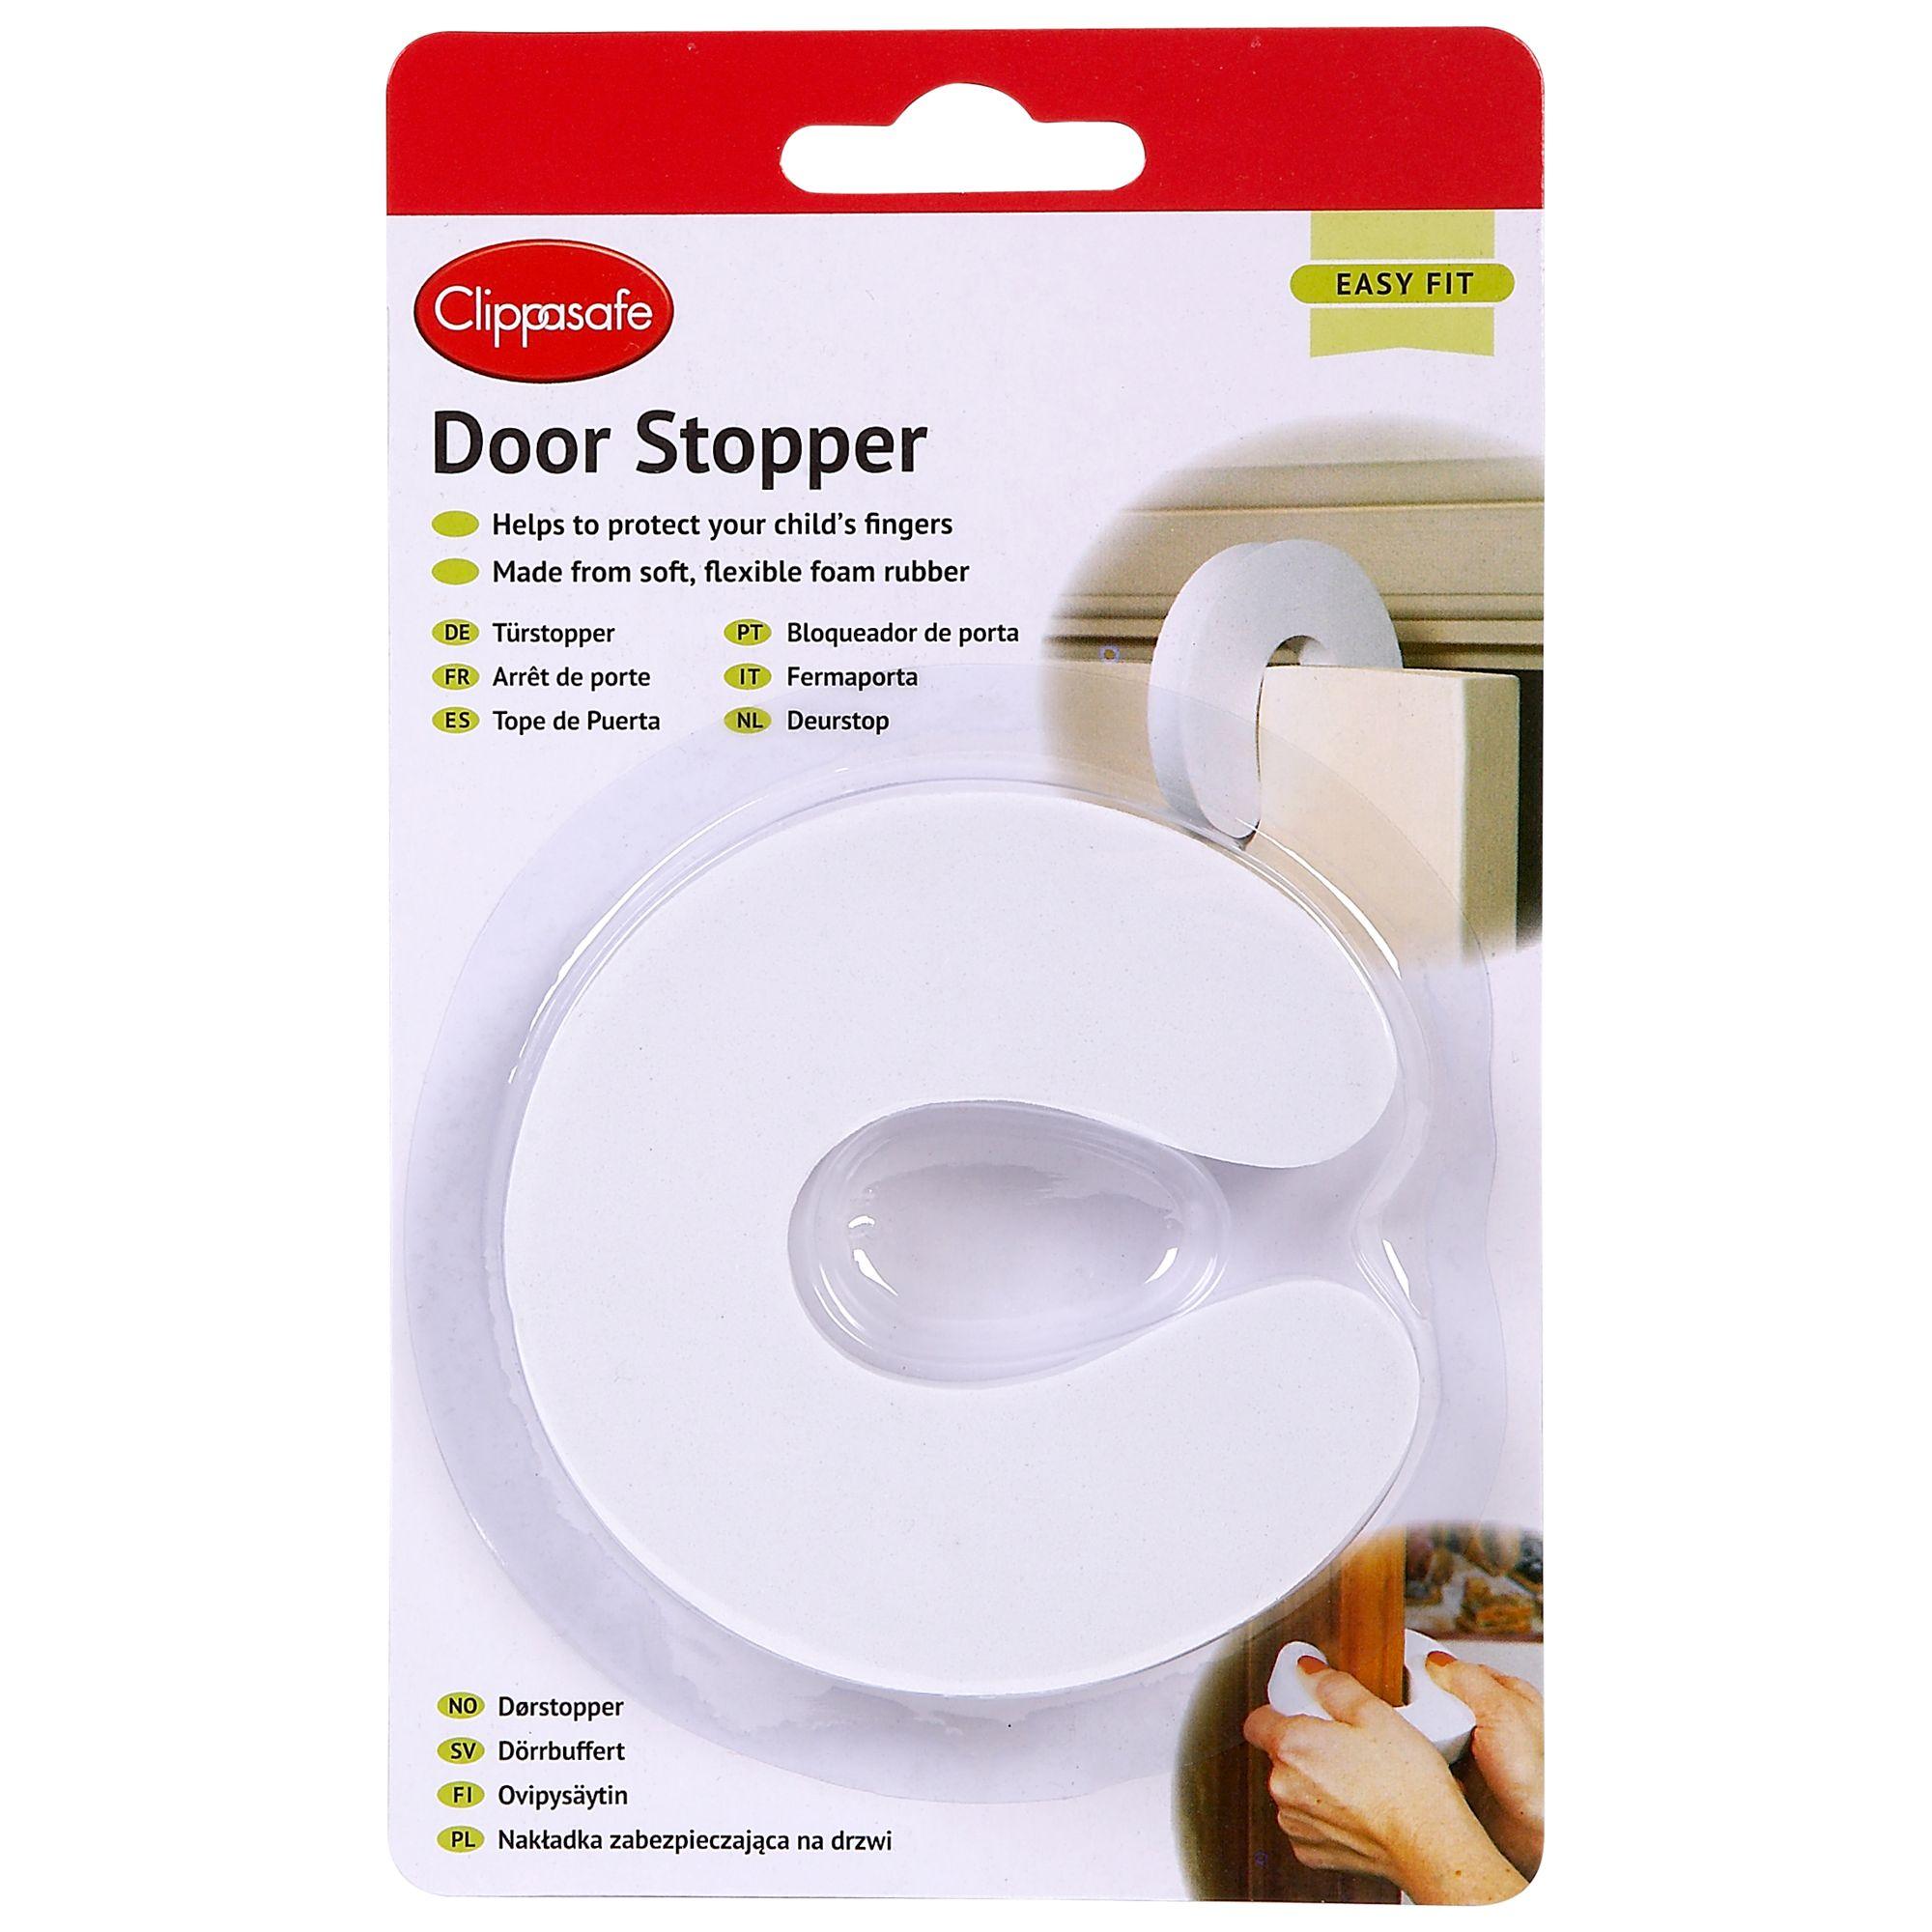 Clippasafe Clippasafe Door Stopper, White